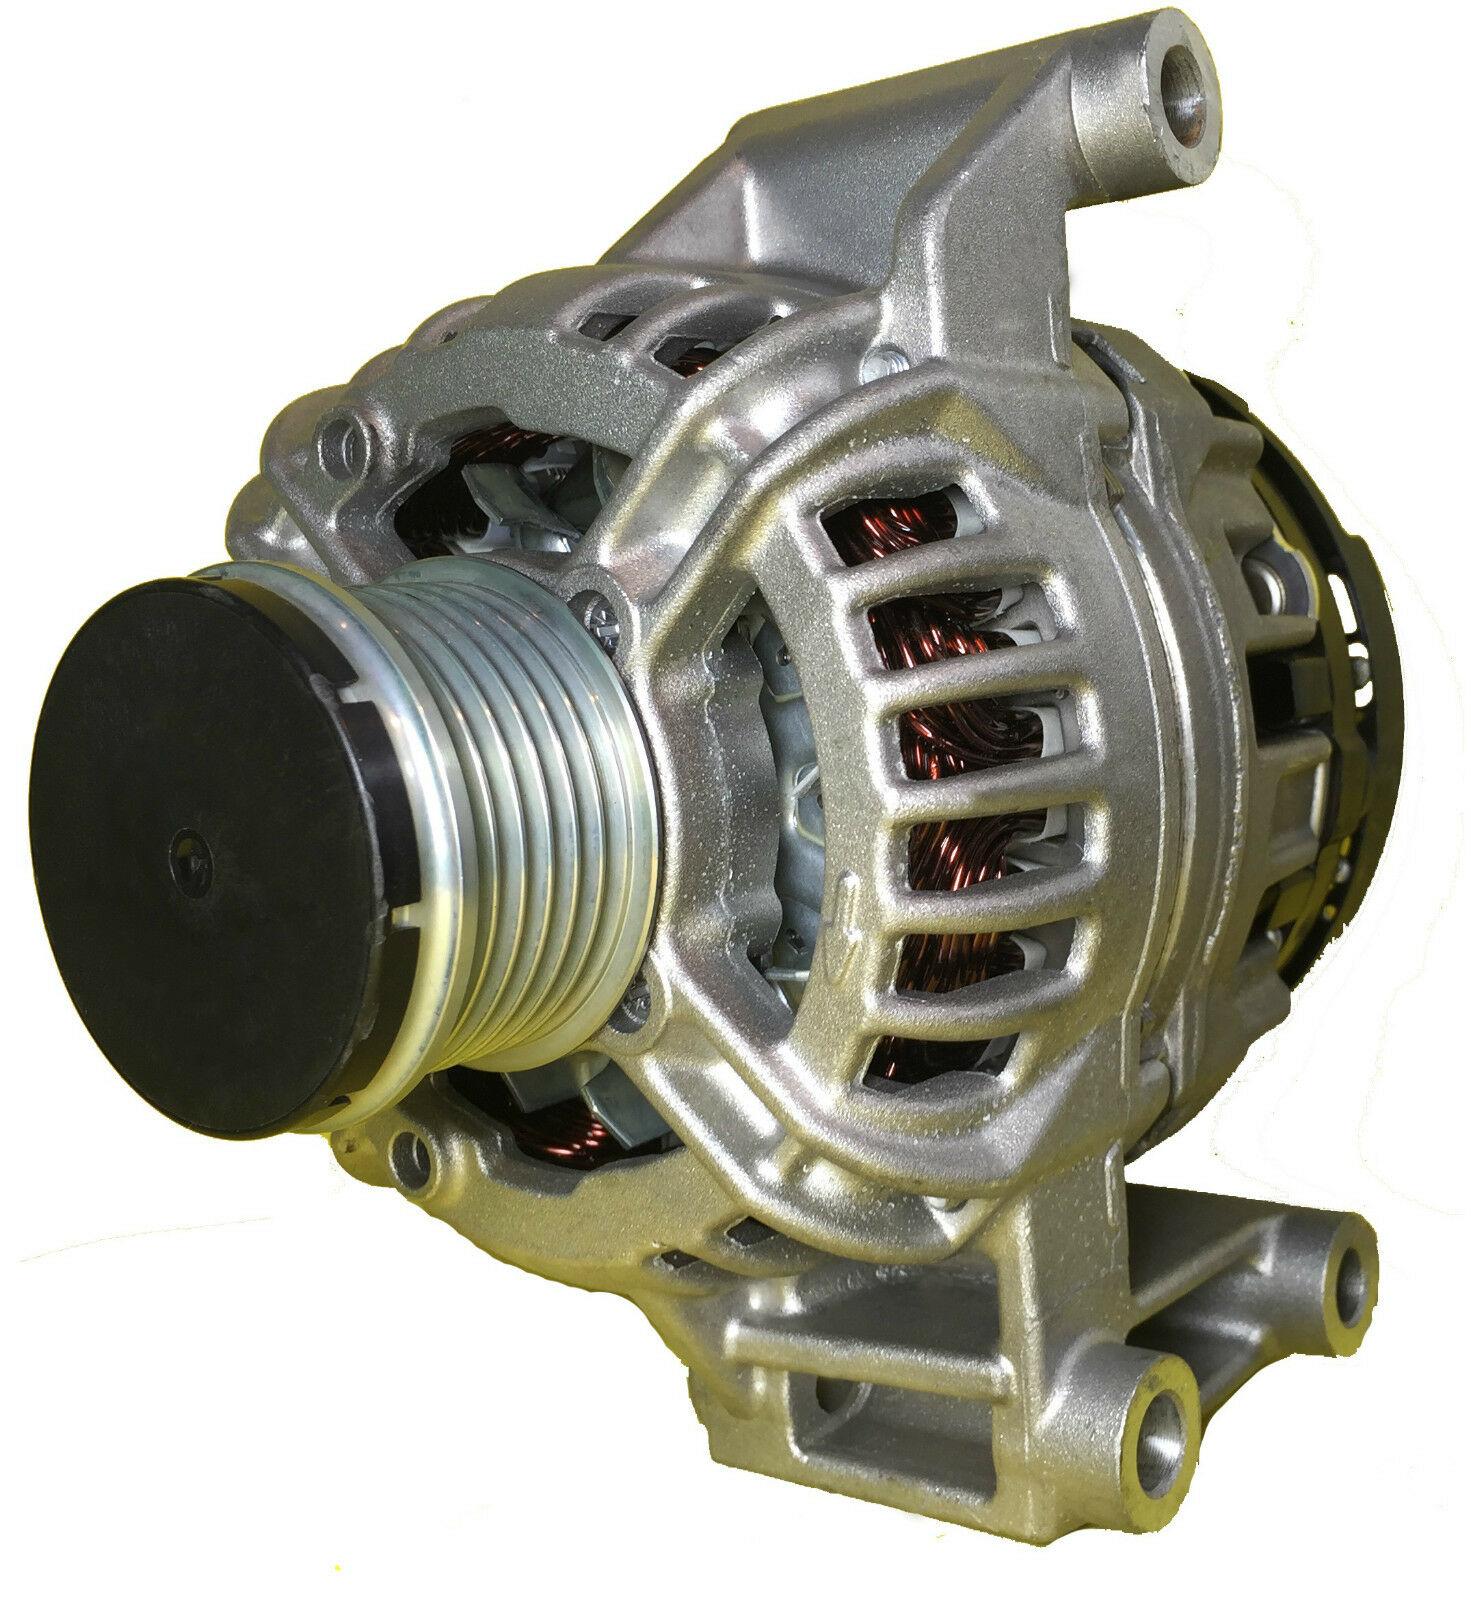 12 Fiat 500 Abarth Alternator Compressor Bracket: DAN599 DENSO 105A 14V FIAT 500, DOBLO, IDEA, PUNTO, GRAND